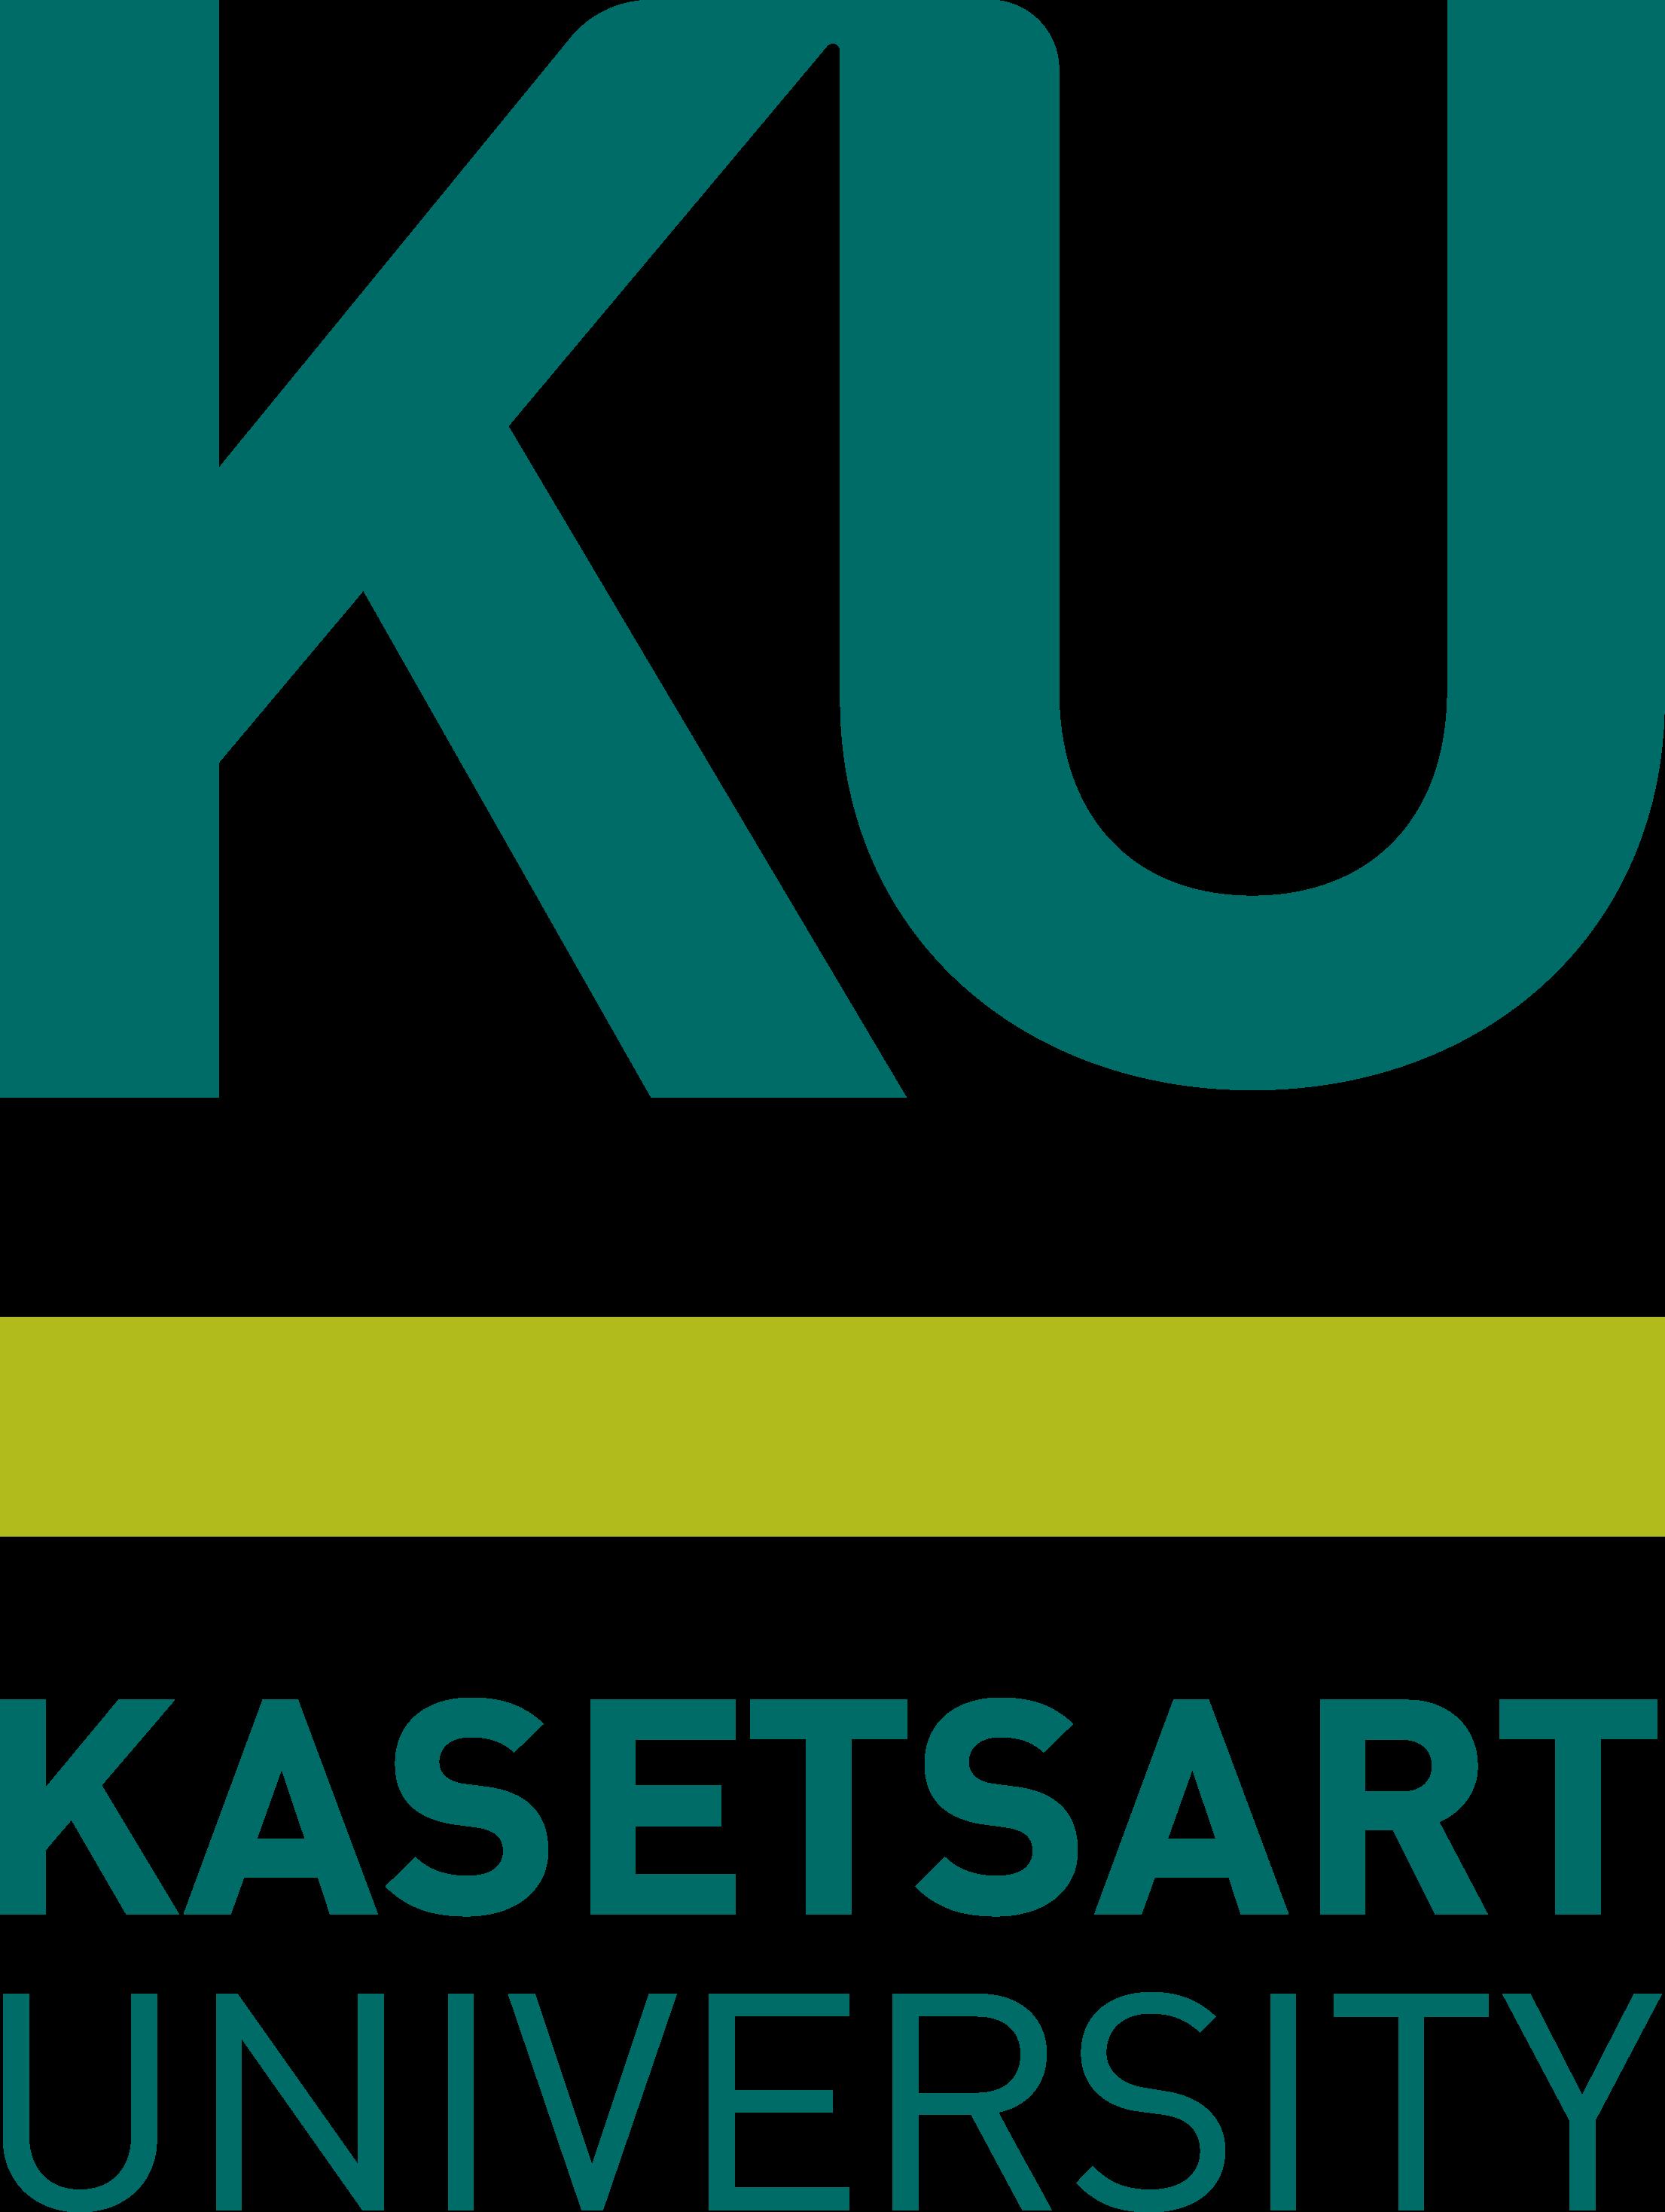 KU11-3